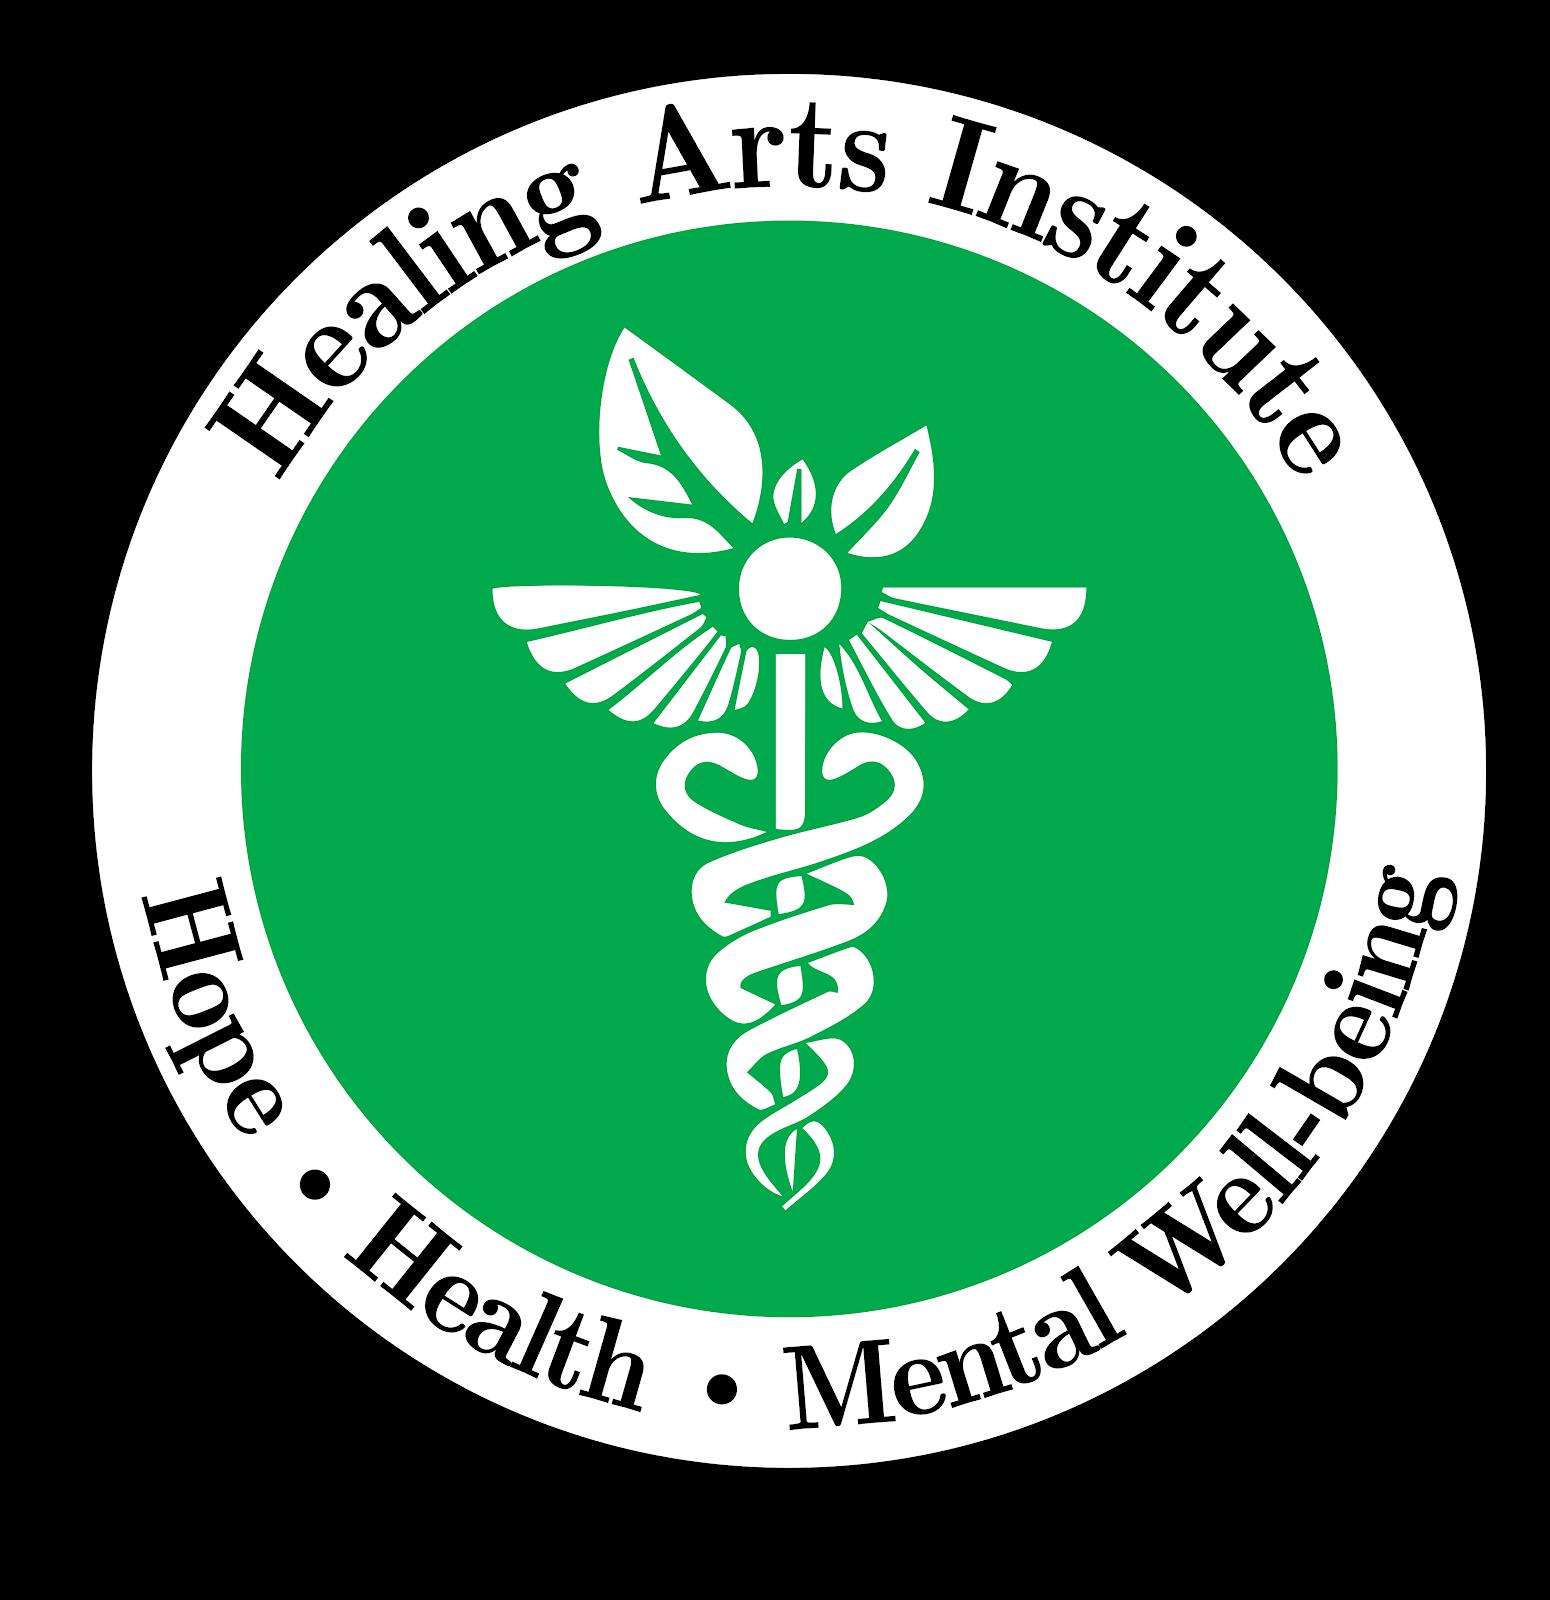 Healing Arts Institute of South Florida International